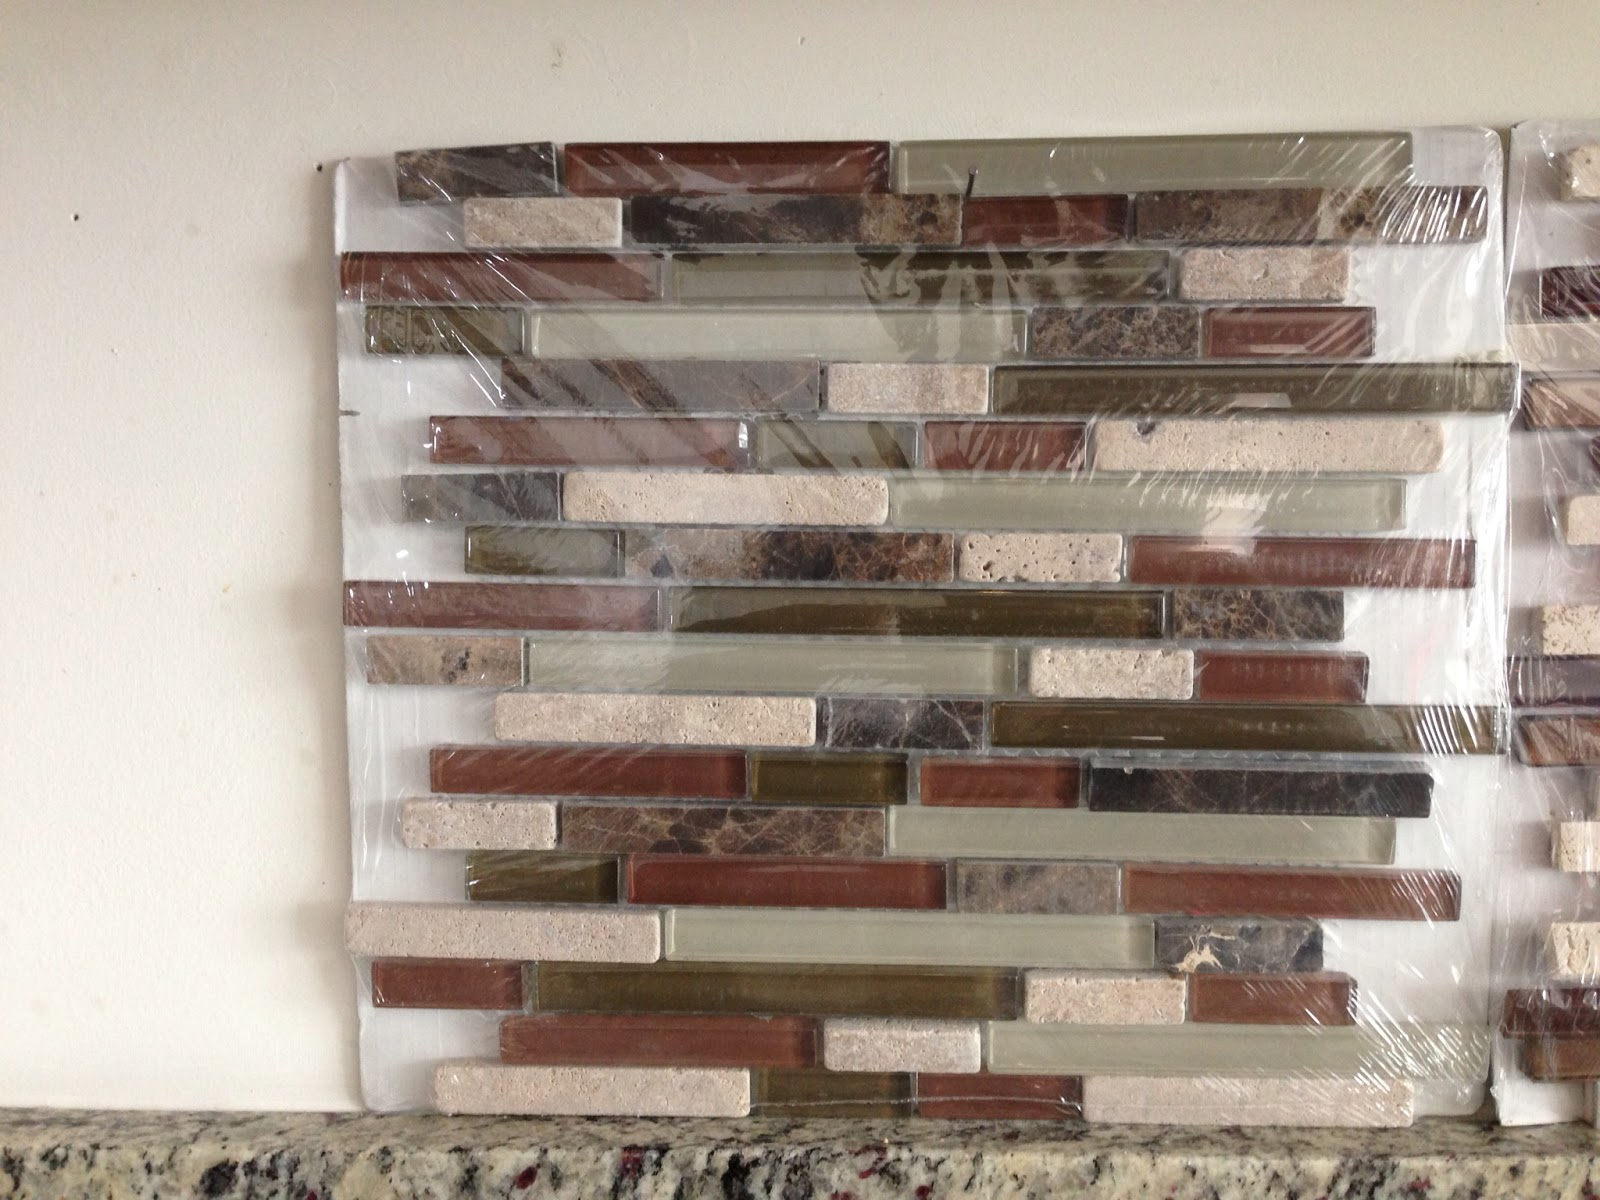 12 x 14 cranberry glass stone strip mosics before installation